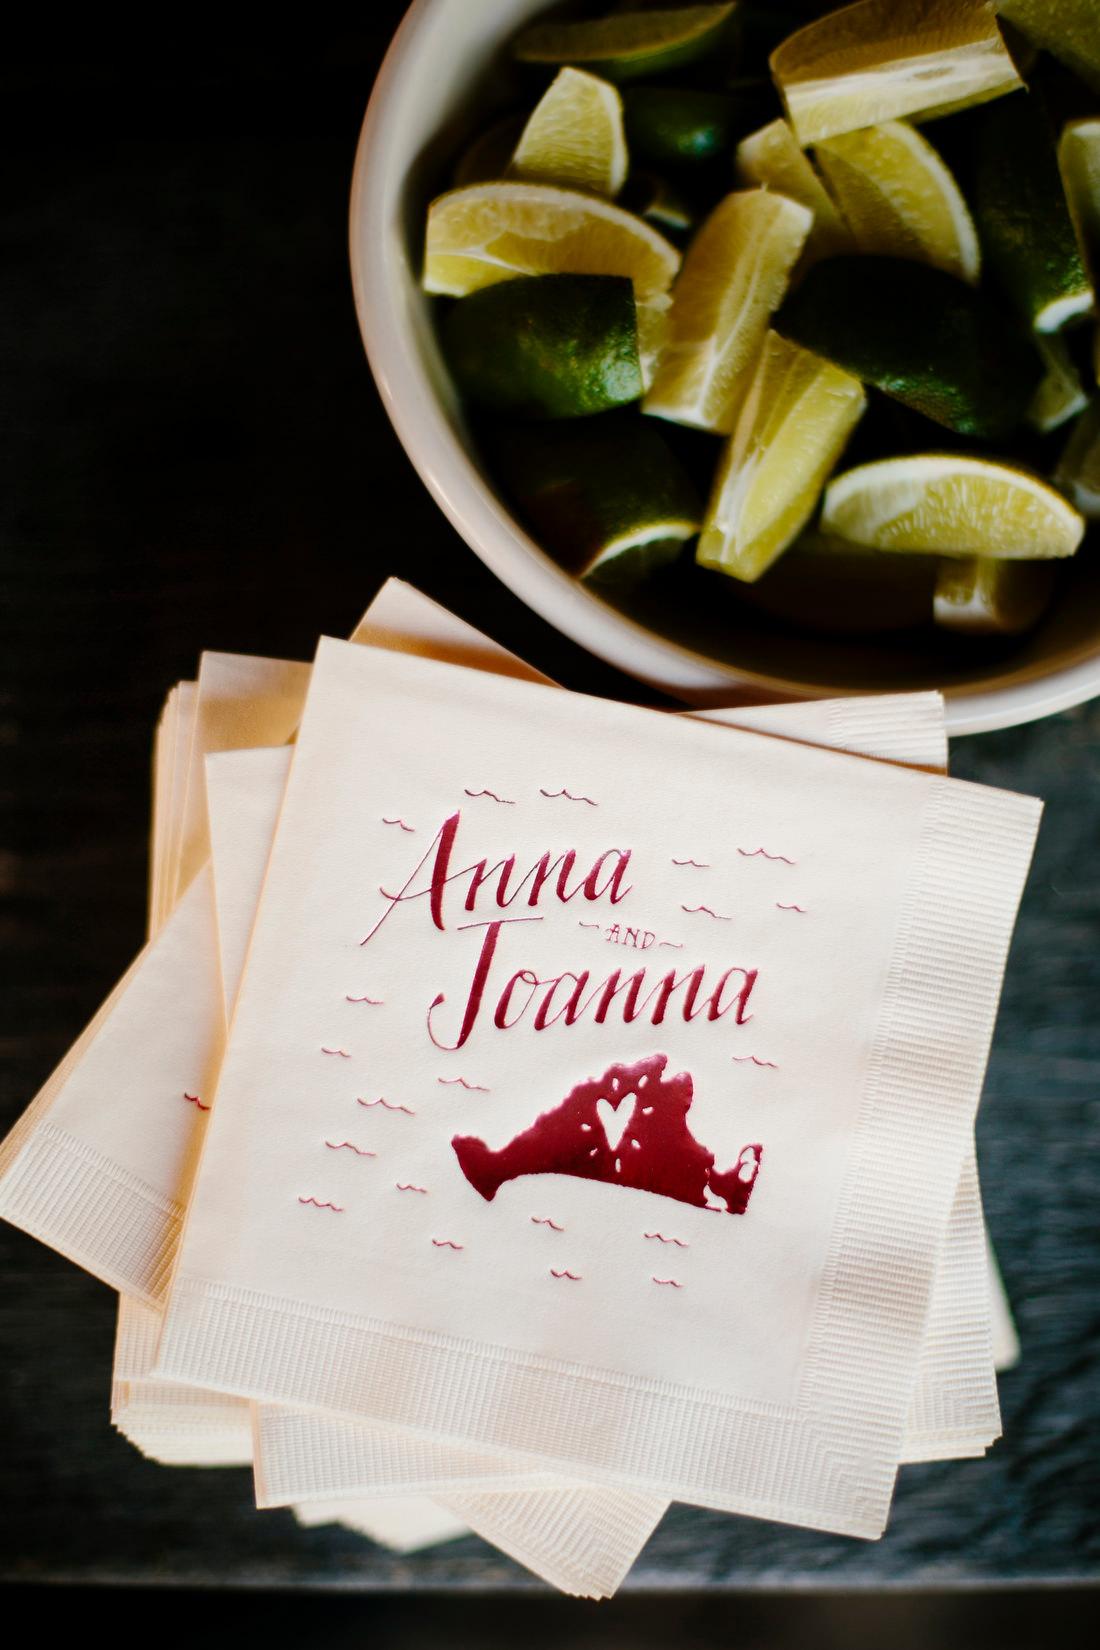 Joanna_Anna-371.JPG